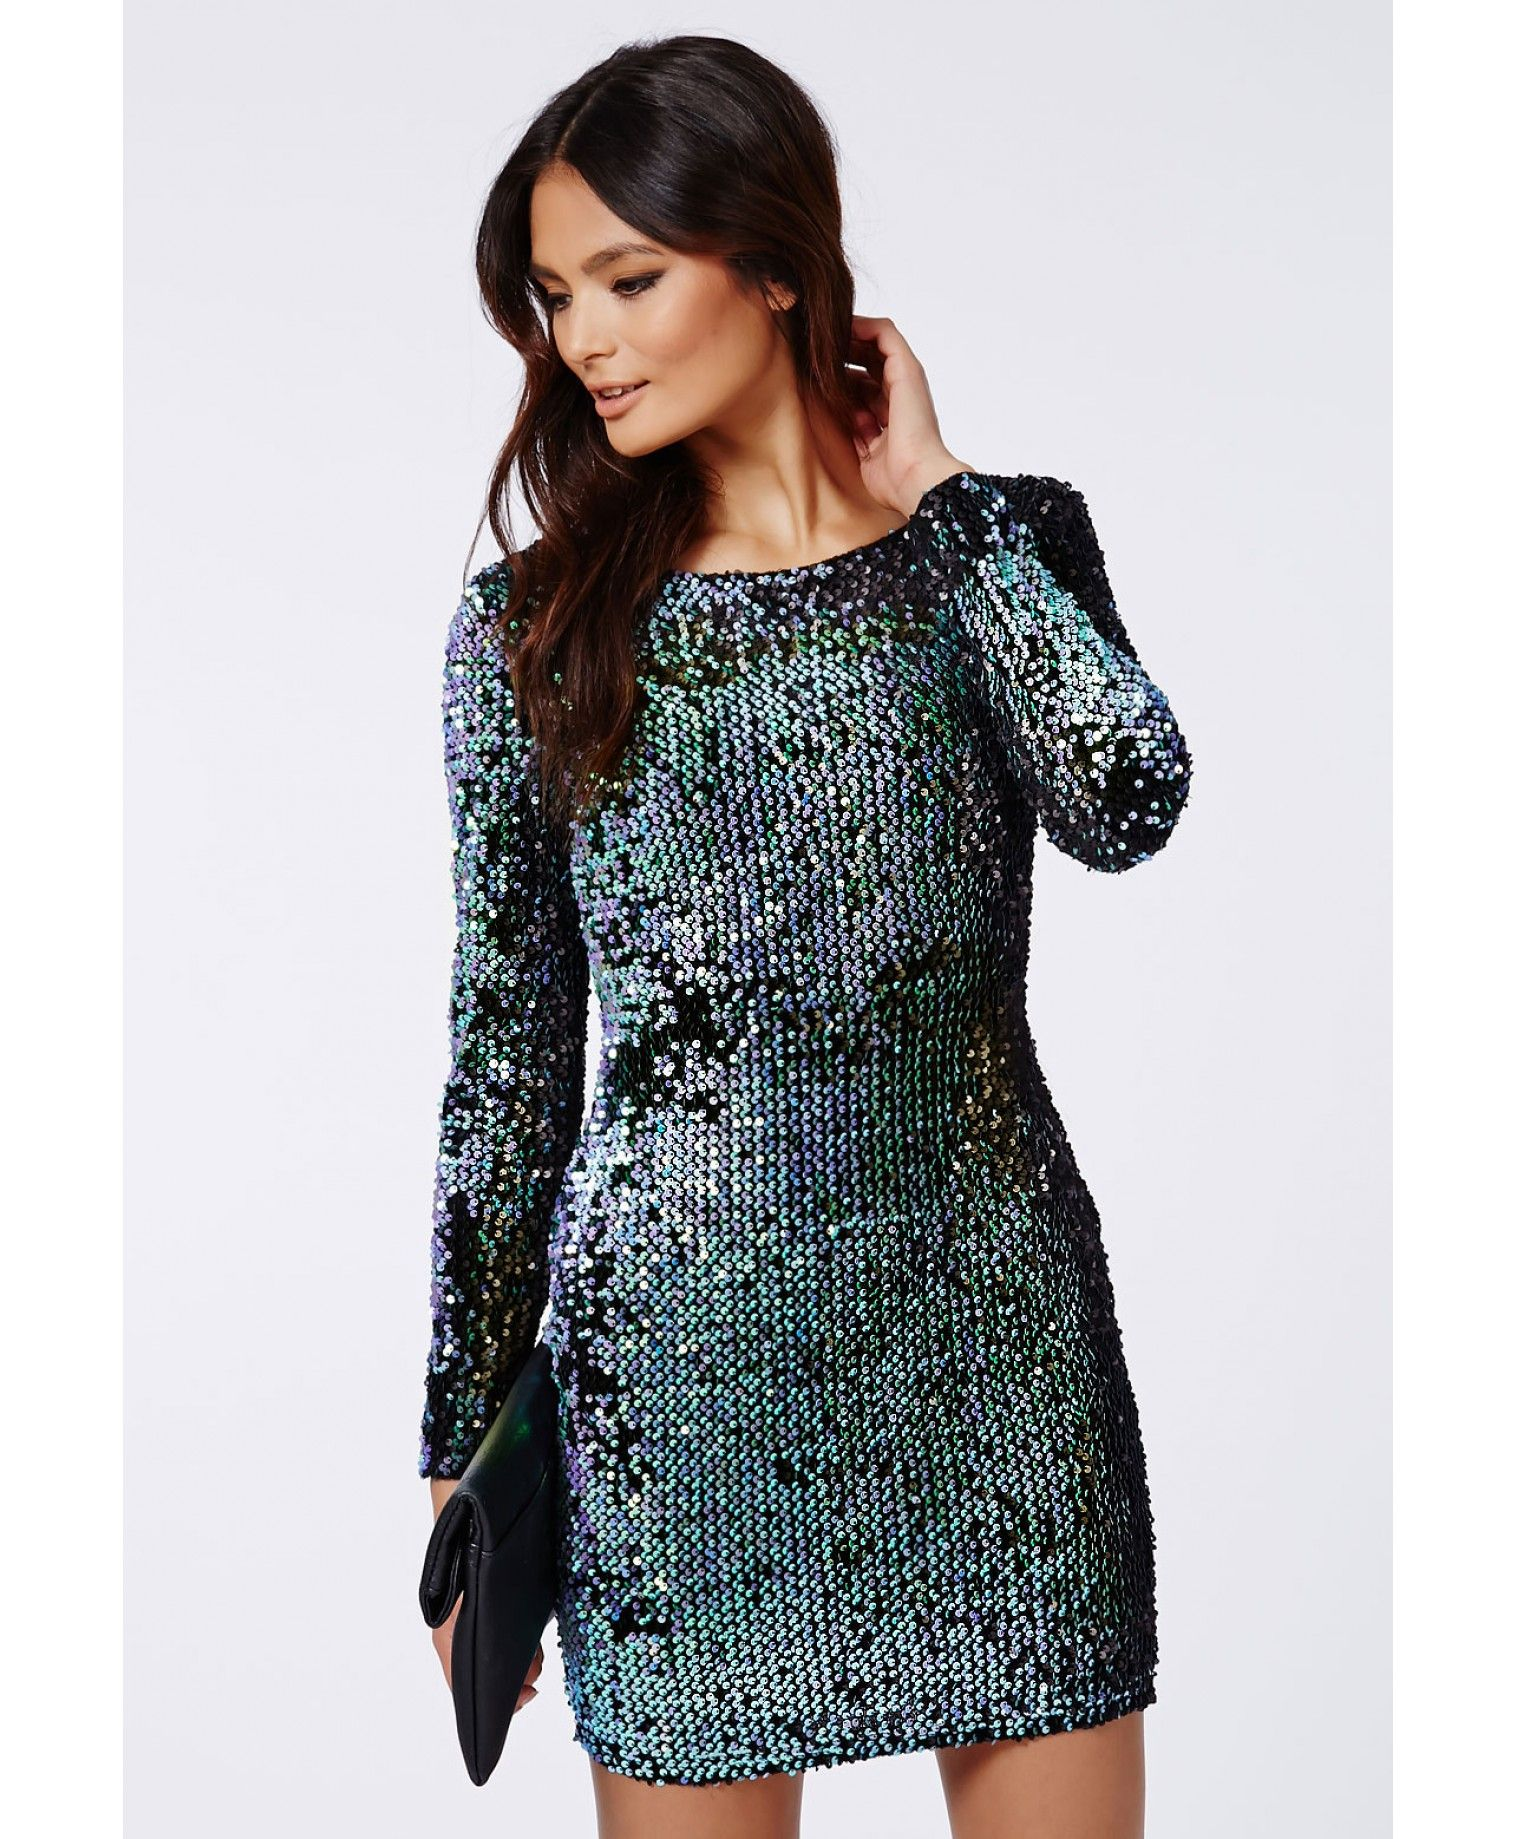 54a7b93a08b Ivy Mermaid Sequin Long Sleeve Mini Dress Green | Short Dresses ...